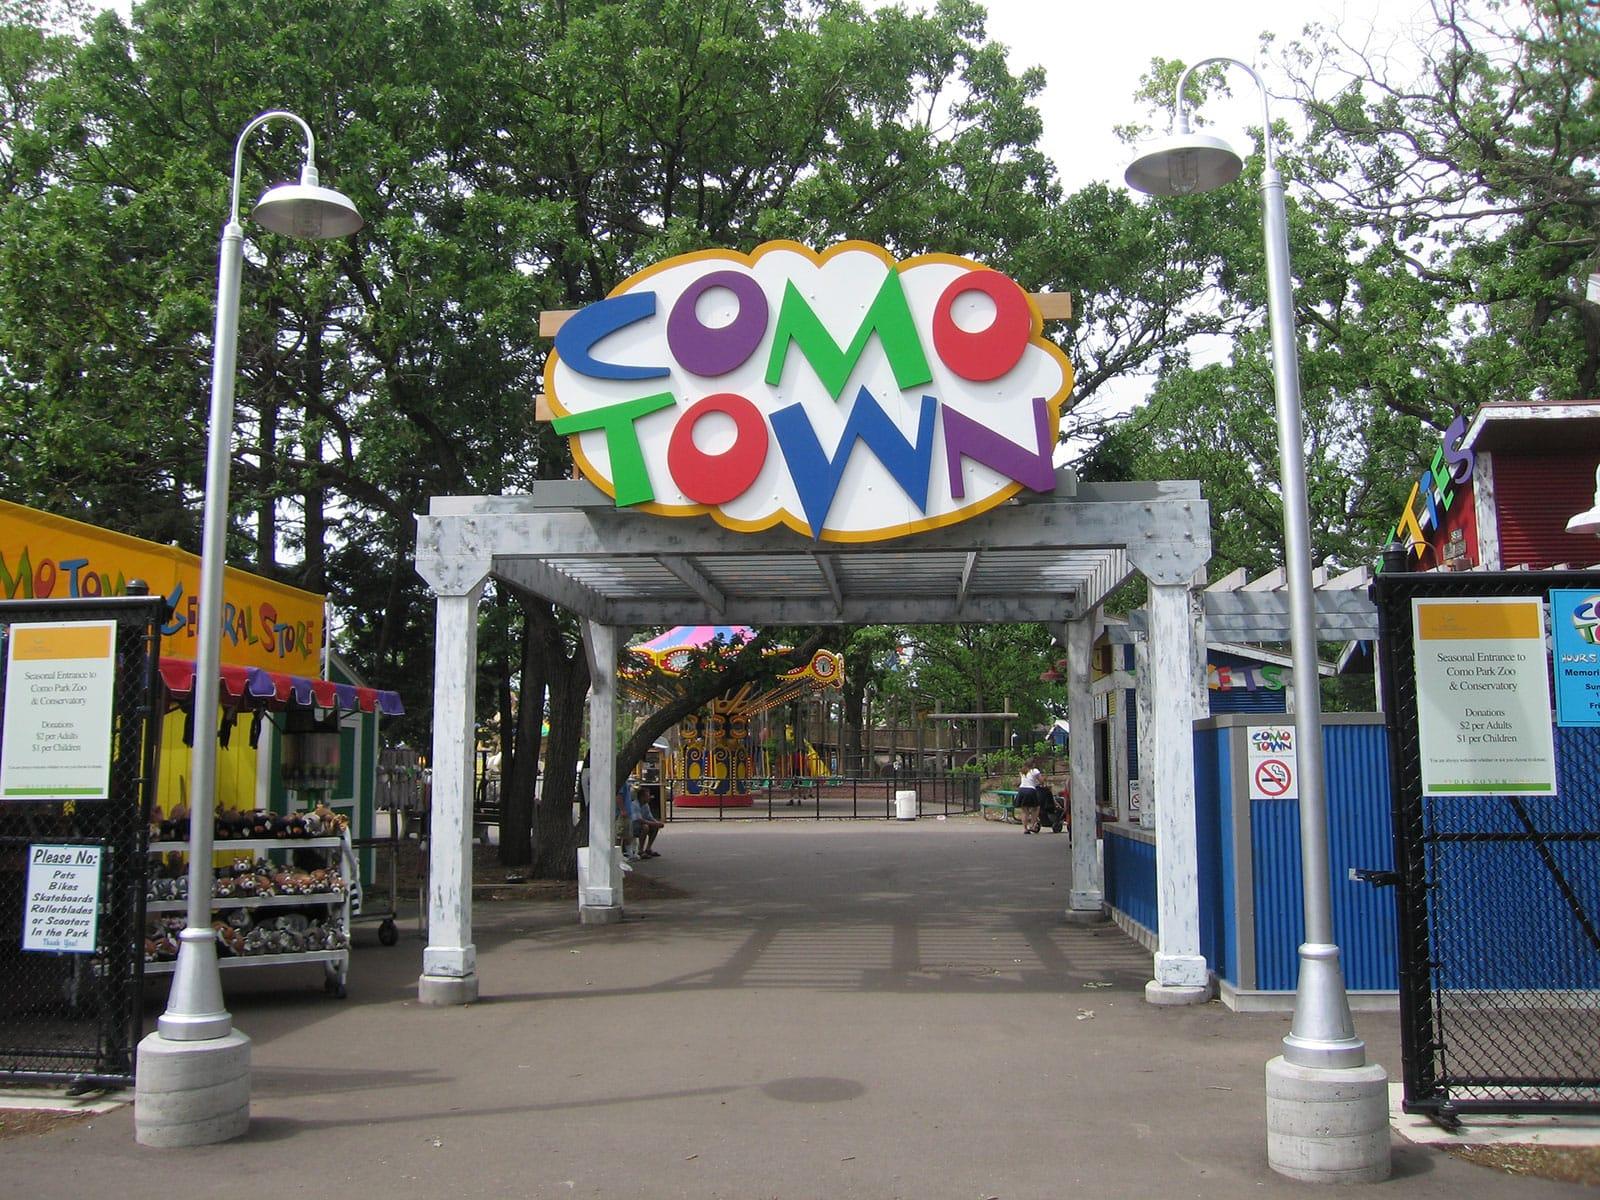 coaster trips: 2006: valleyfair, como town, nickelodeon universe